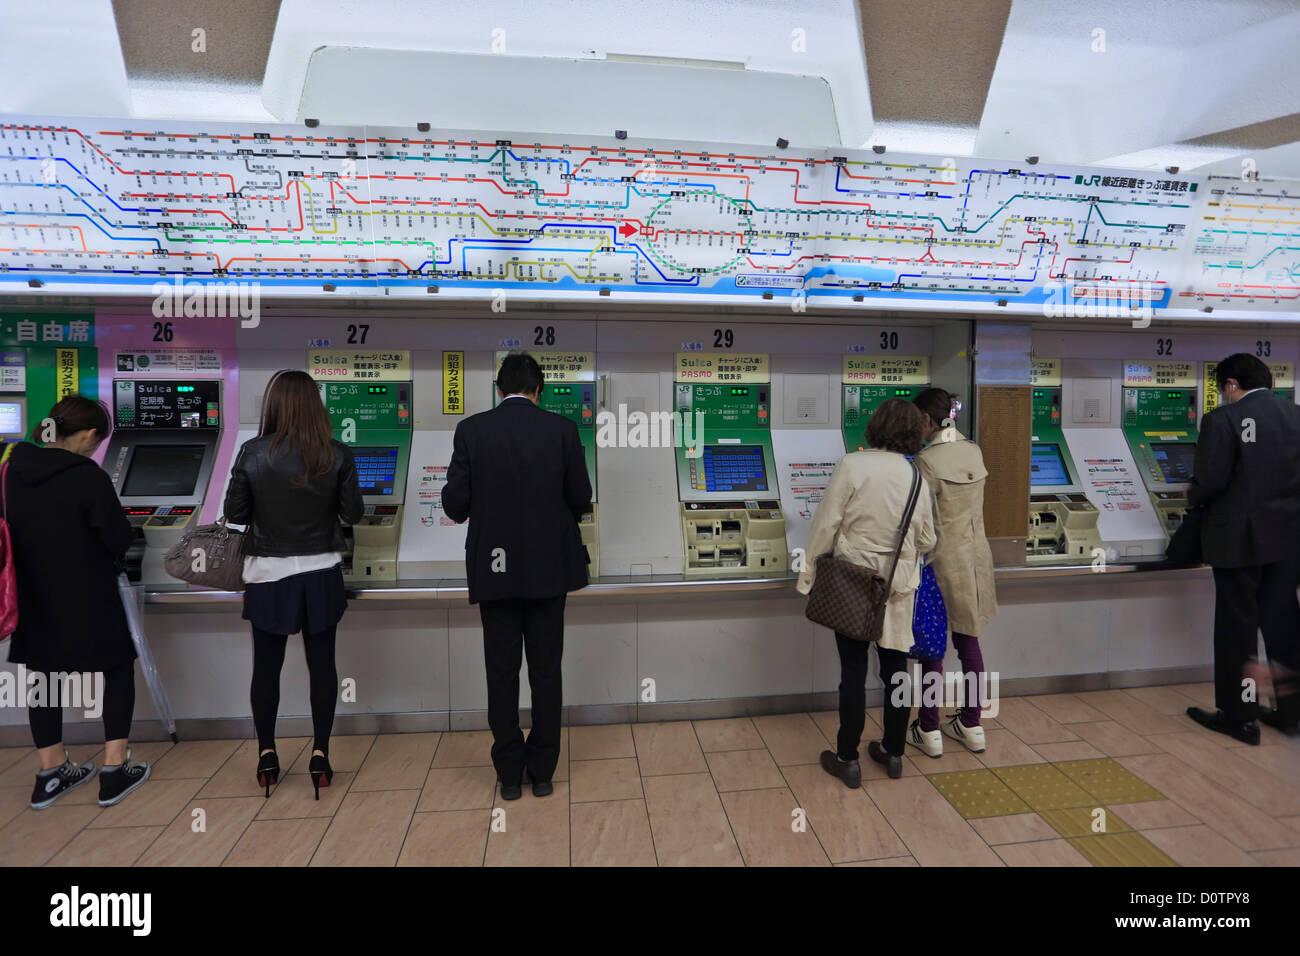 Japan, Asia, holiday, travel, Tokyo, City, Shinjuku, Station, Tickets, vendor, automate, dispenser - Stock Image